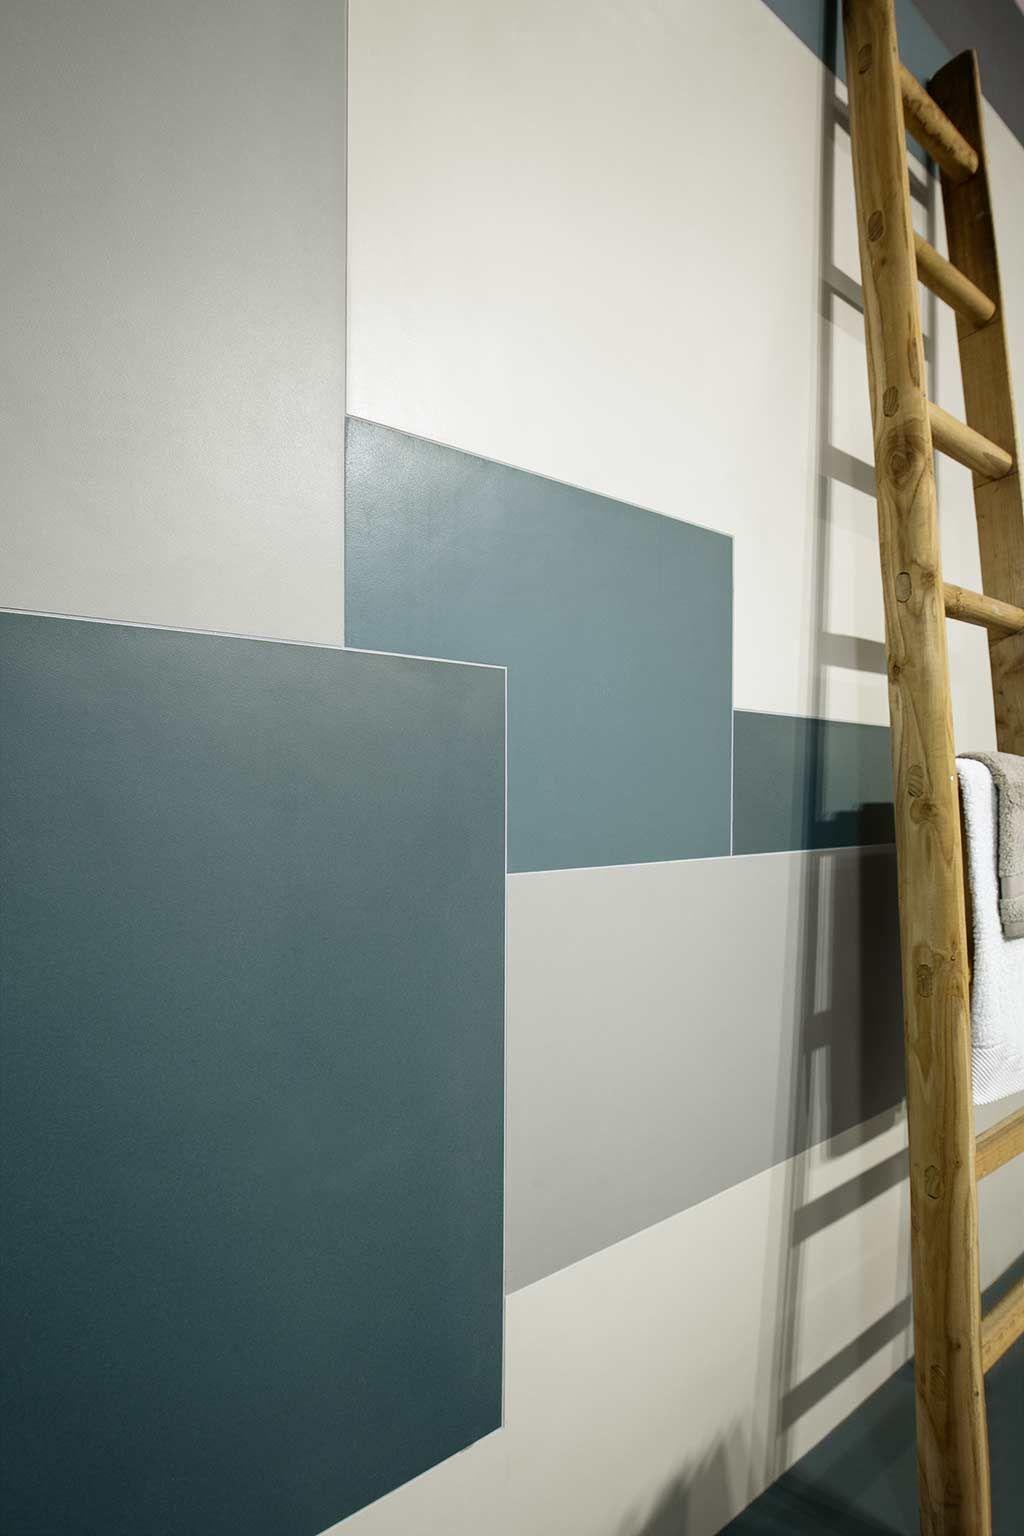 Neutra 6 0 casa dolce casa casamood florim ceramiche s p a tile pinterest casa - Casamood ceramiche ...